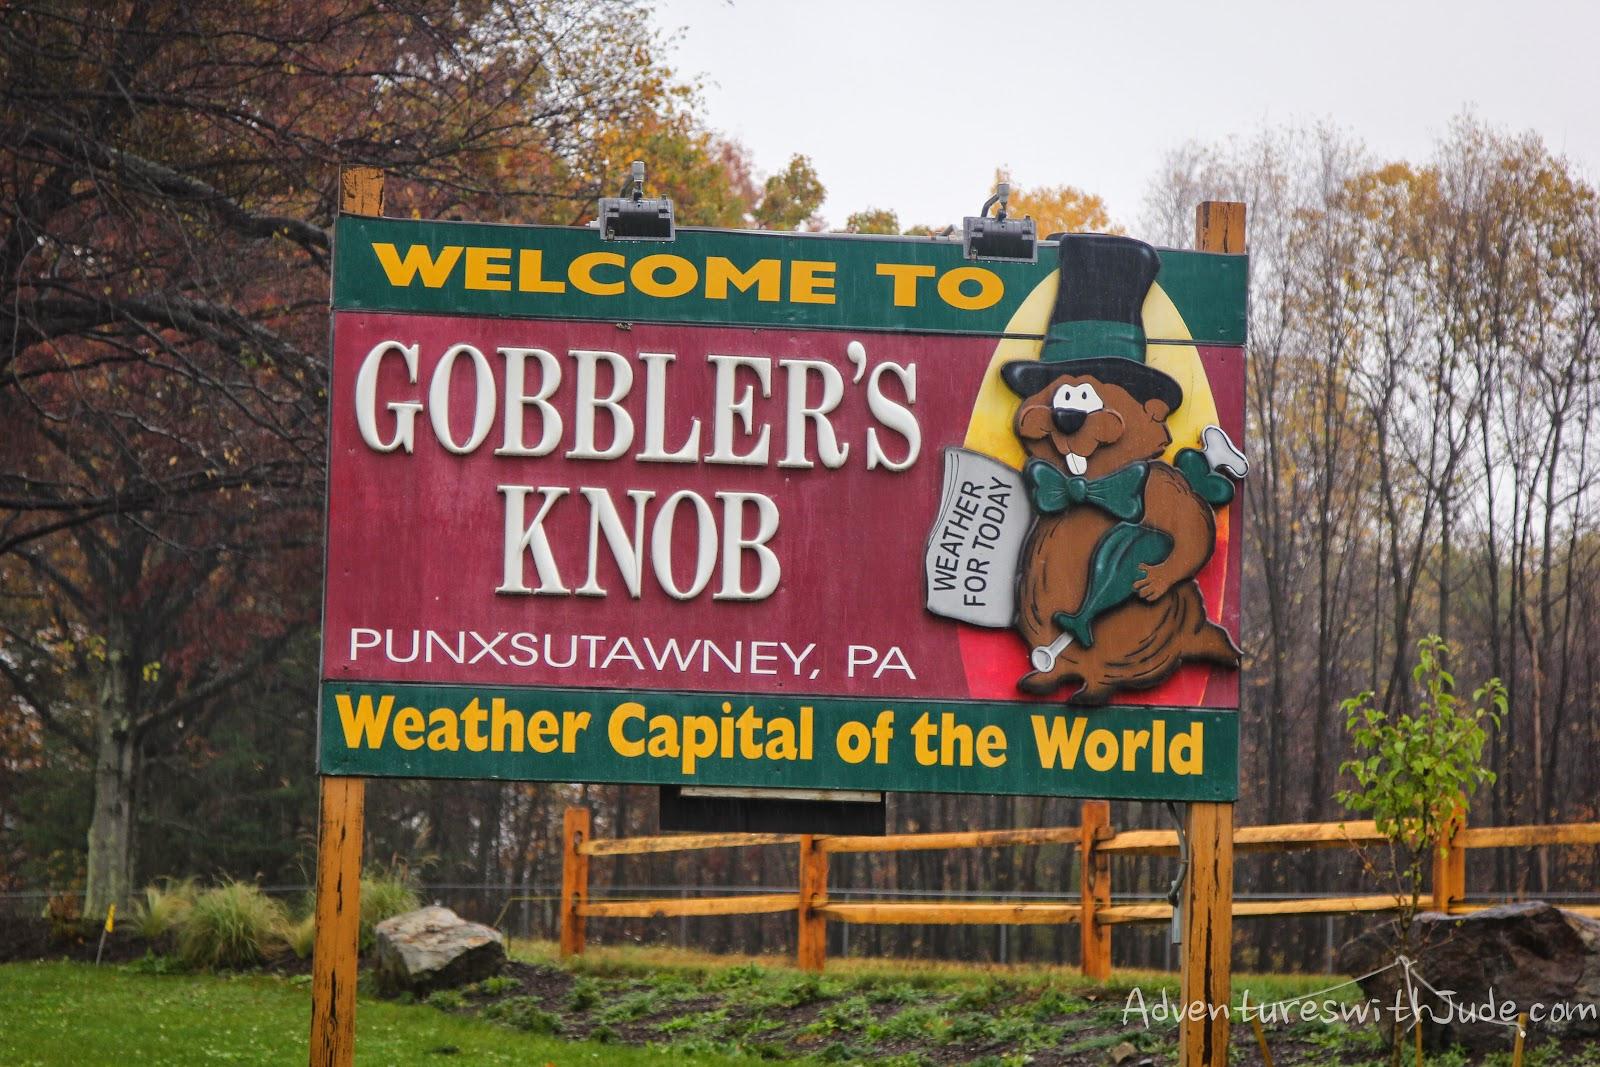 Gobblers Knob Punxsutawney, PA